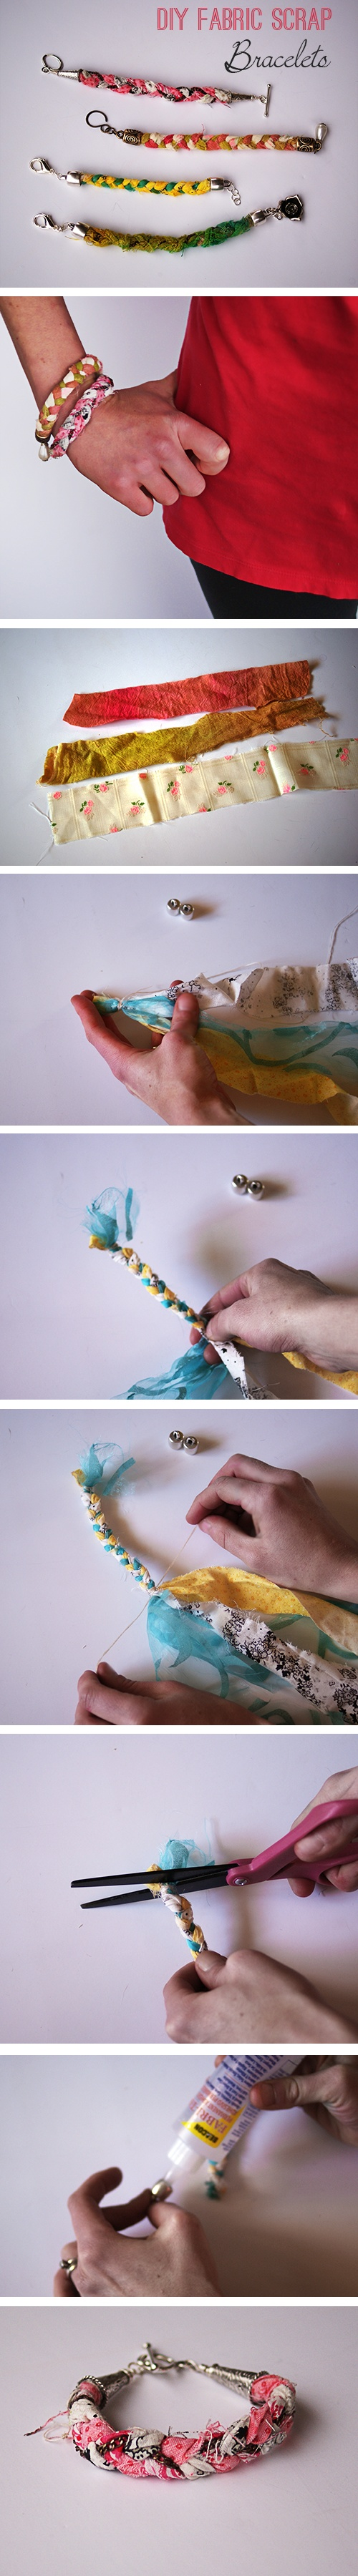 Paso a paso para hacer esta pulsera de tela tejida como trenza de cabello